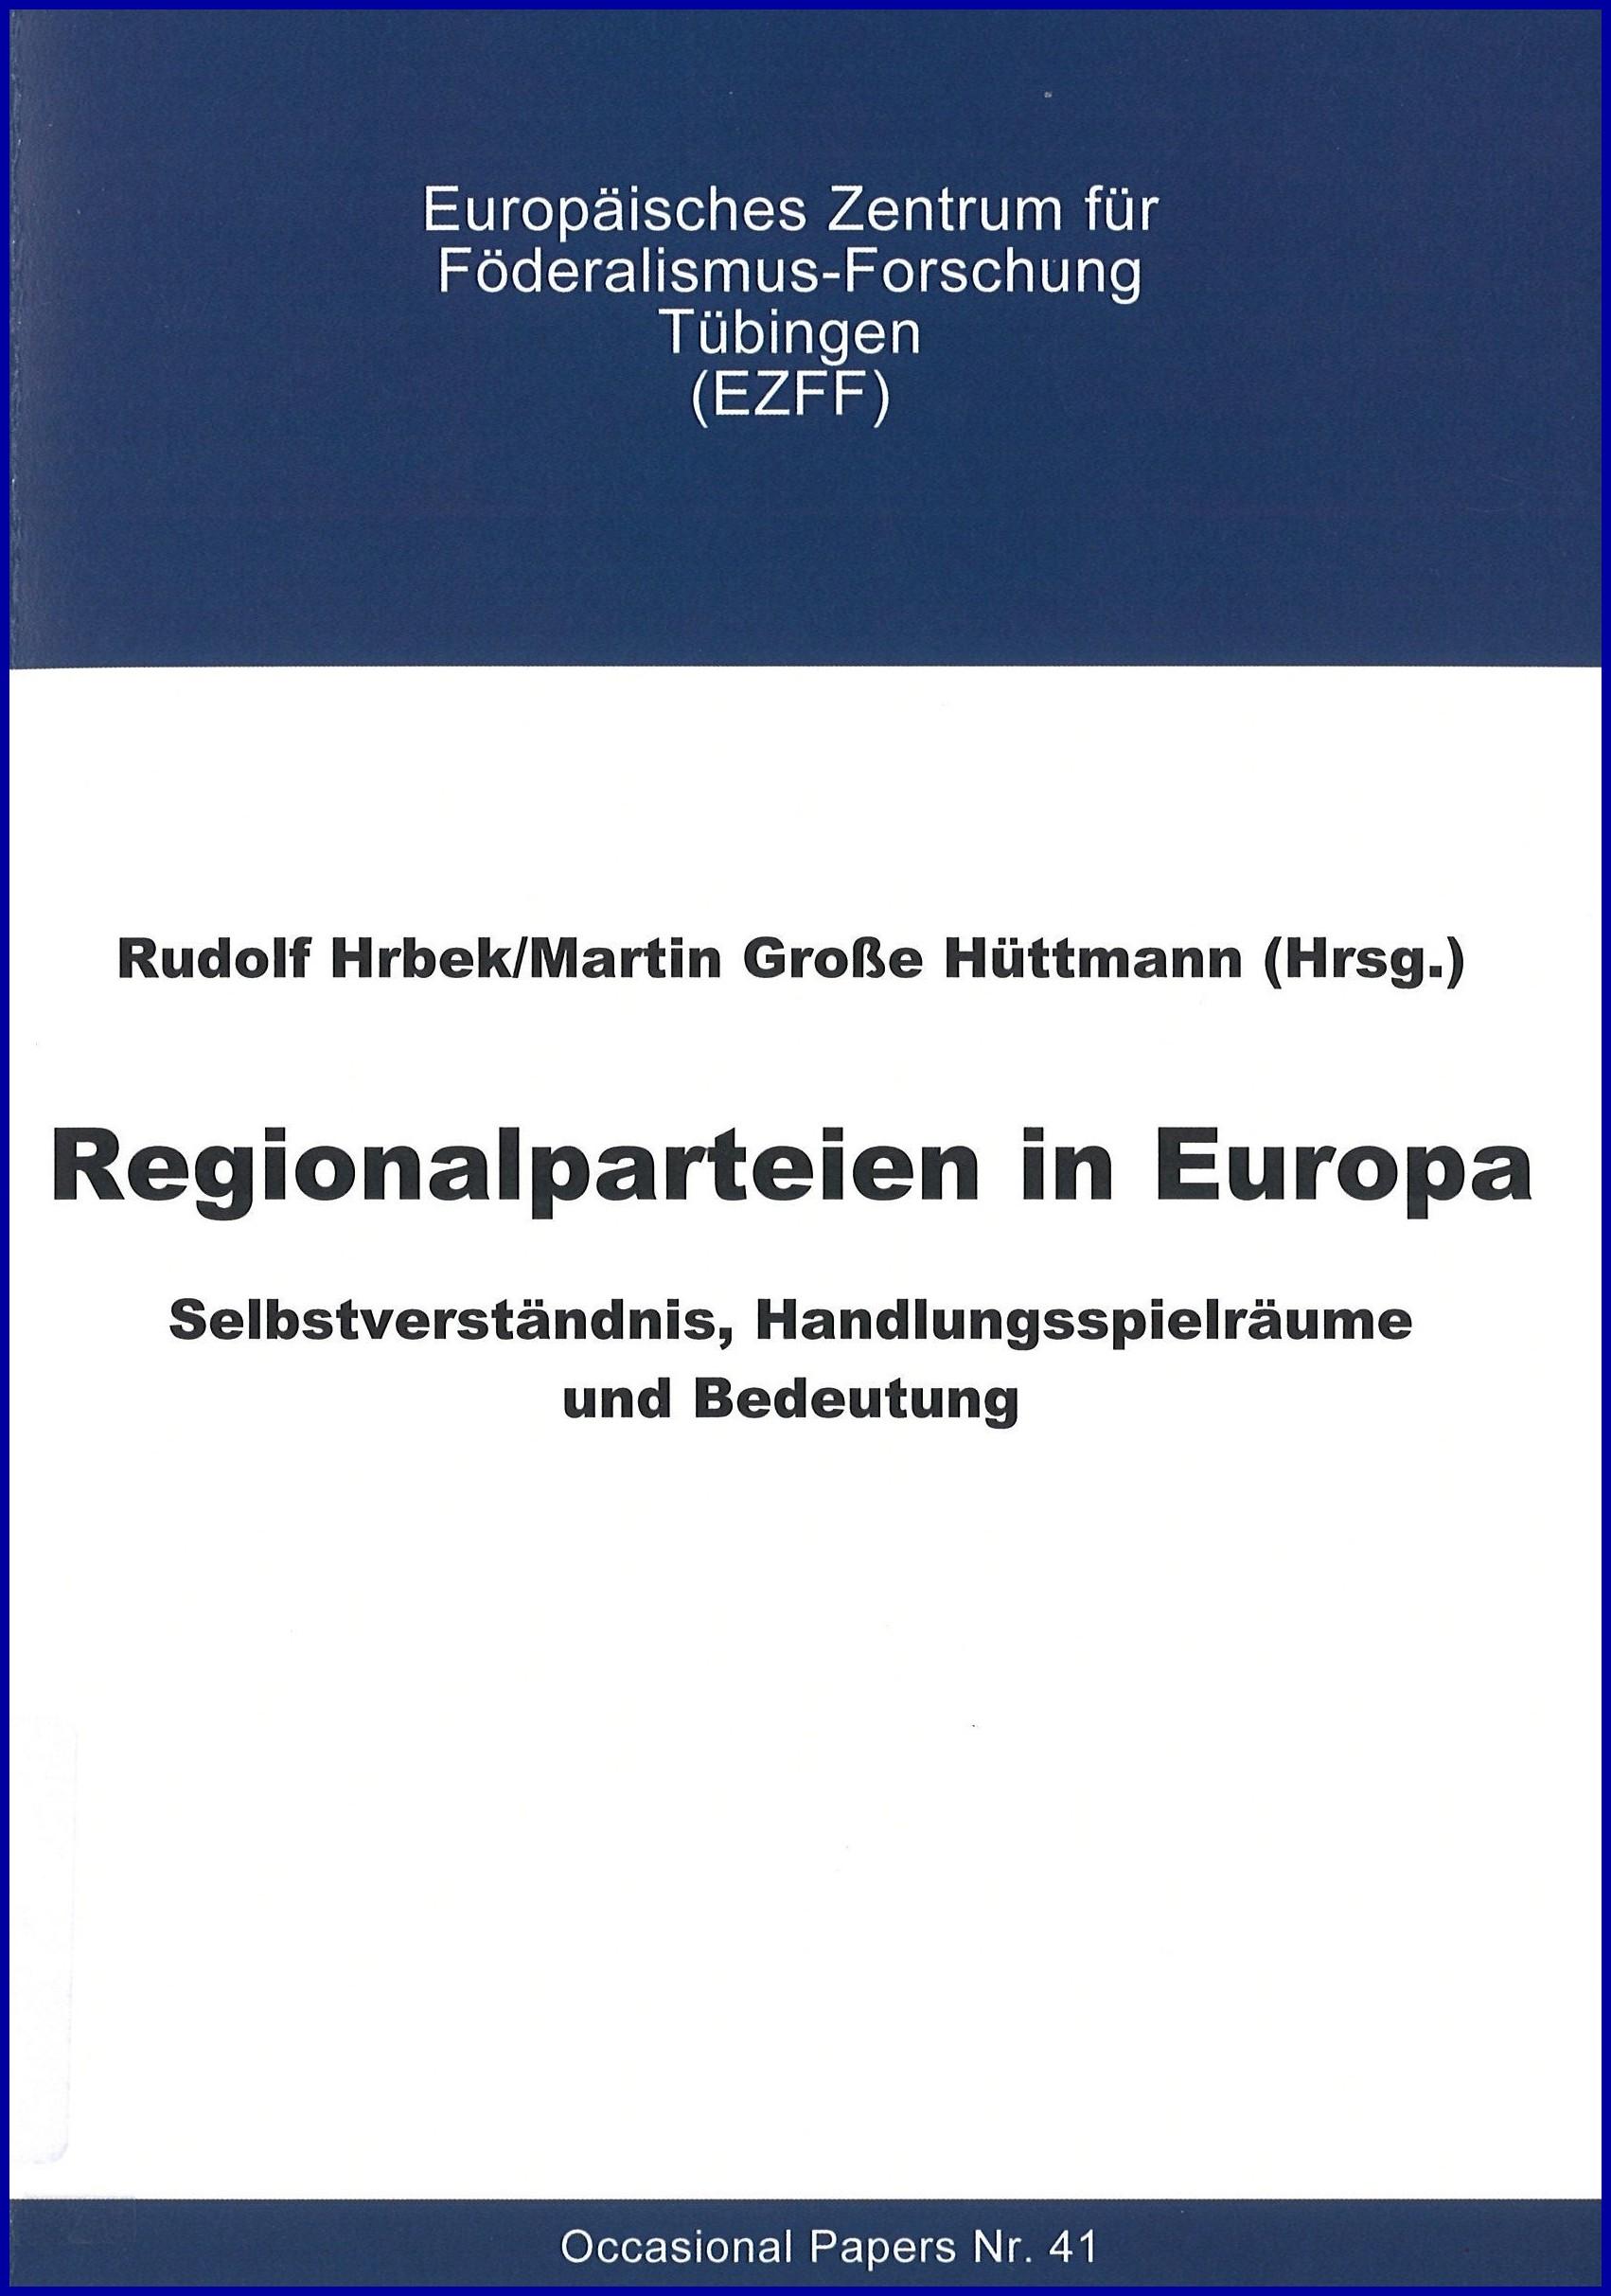 Regionalparteien in Europa